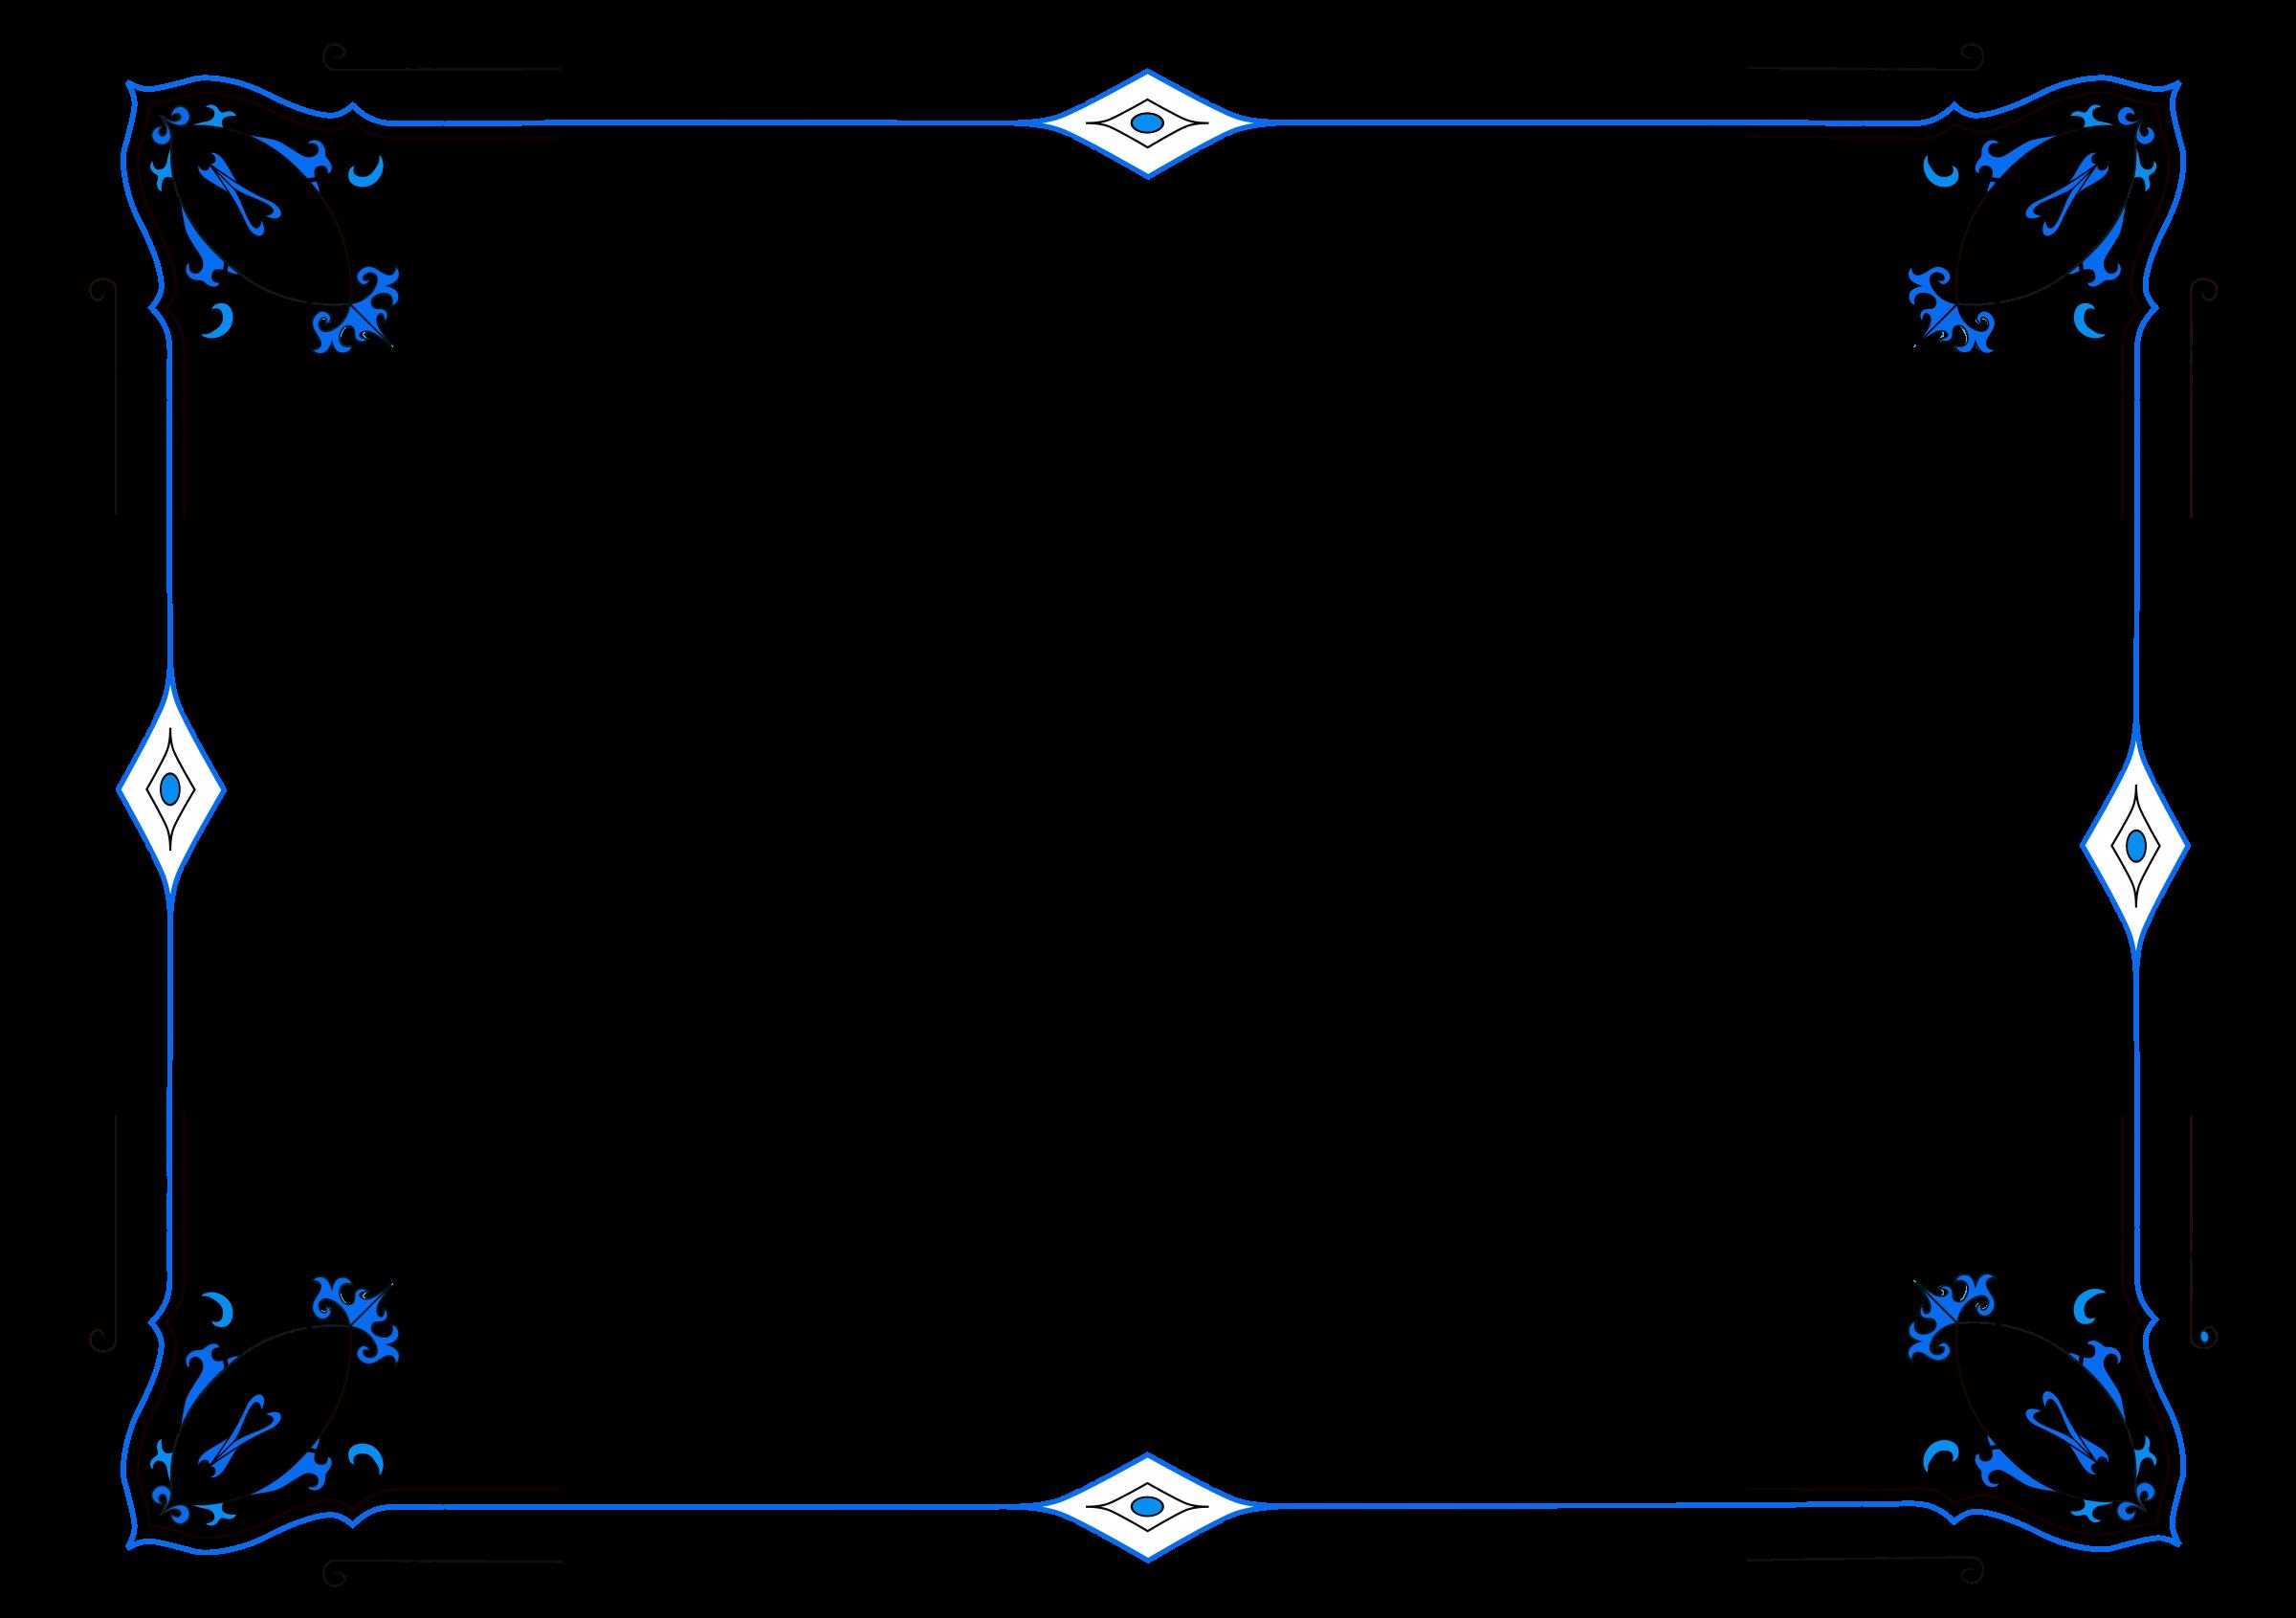 Border variation in big. Clipart borders blue